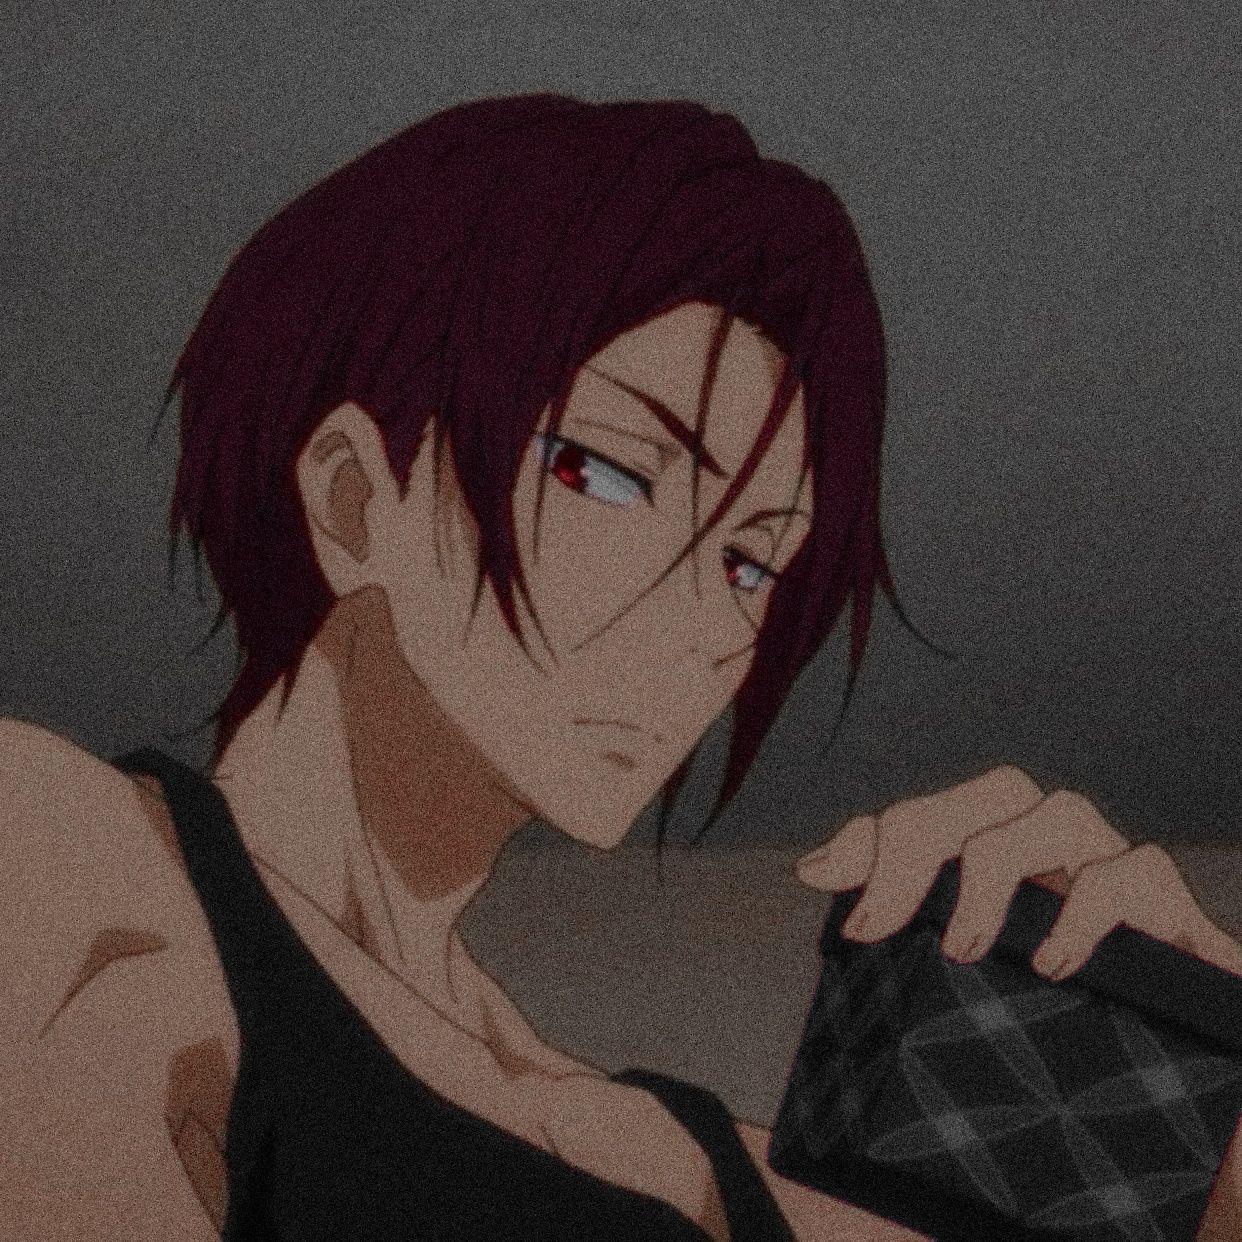 Н'Ÿð'–𝑛 Н'šð'Žð'¡ð'ð'¢ð'œð'˜ð'Ž Н™žð™˜ð™¤ð™£ Aesthetic Anime Anime Free Anime Gifs, anime gifs, and free.animated gif about gif in anime • manga by alicia. 𝑟𝑖𝑛 𝑚𝑎𝑡𝑠𝑢𝑜𝑘𝑎 𝙞𝙘𝙤𝙣 aesthetic anime